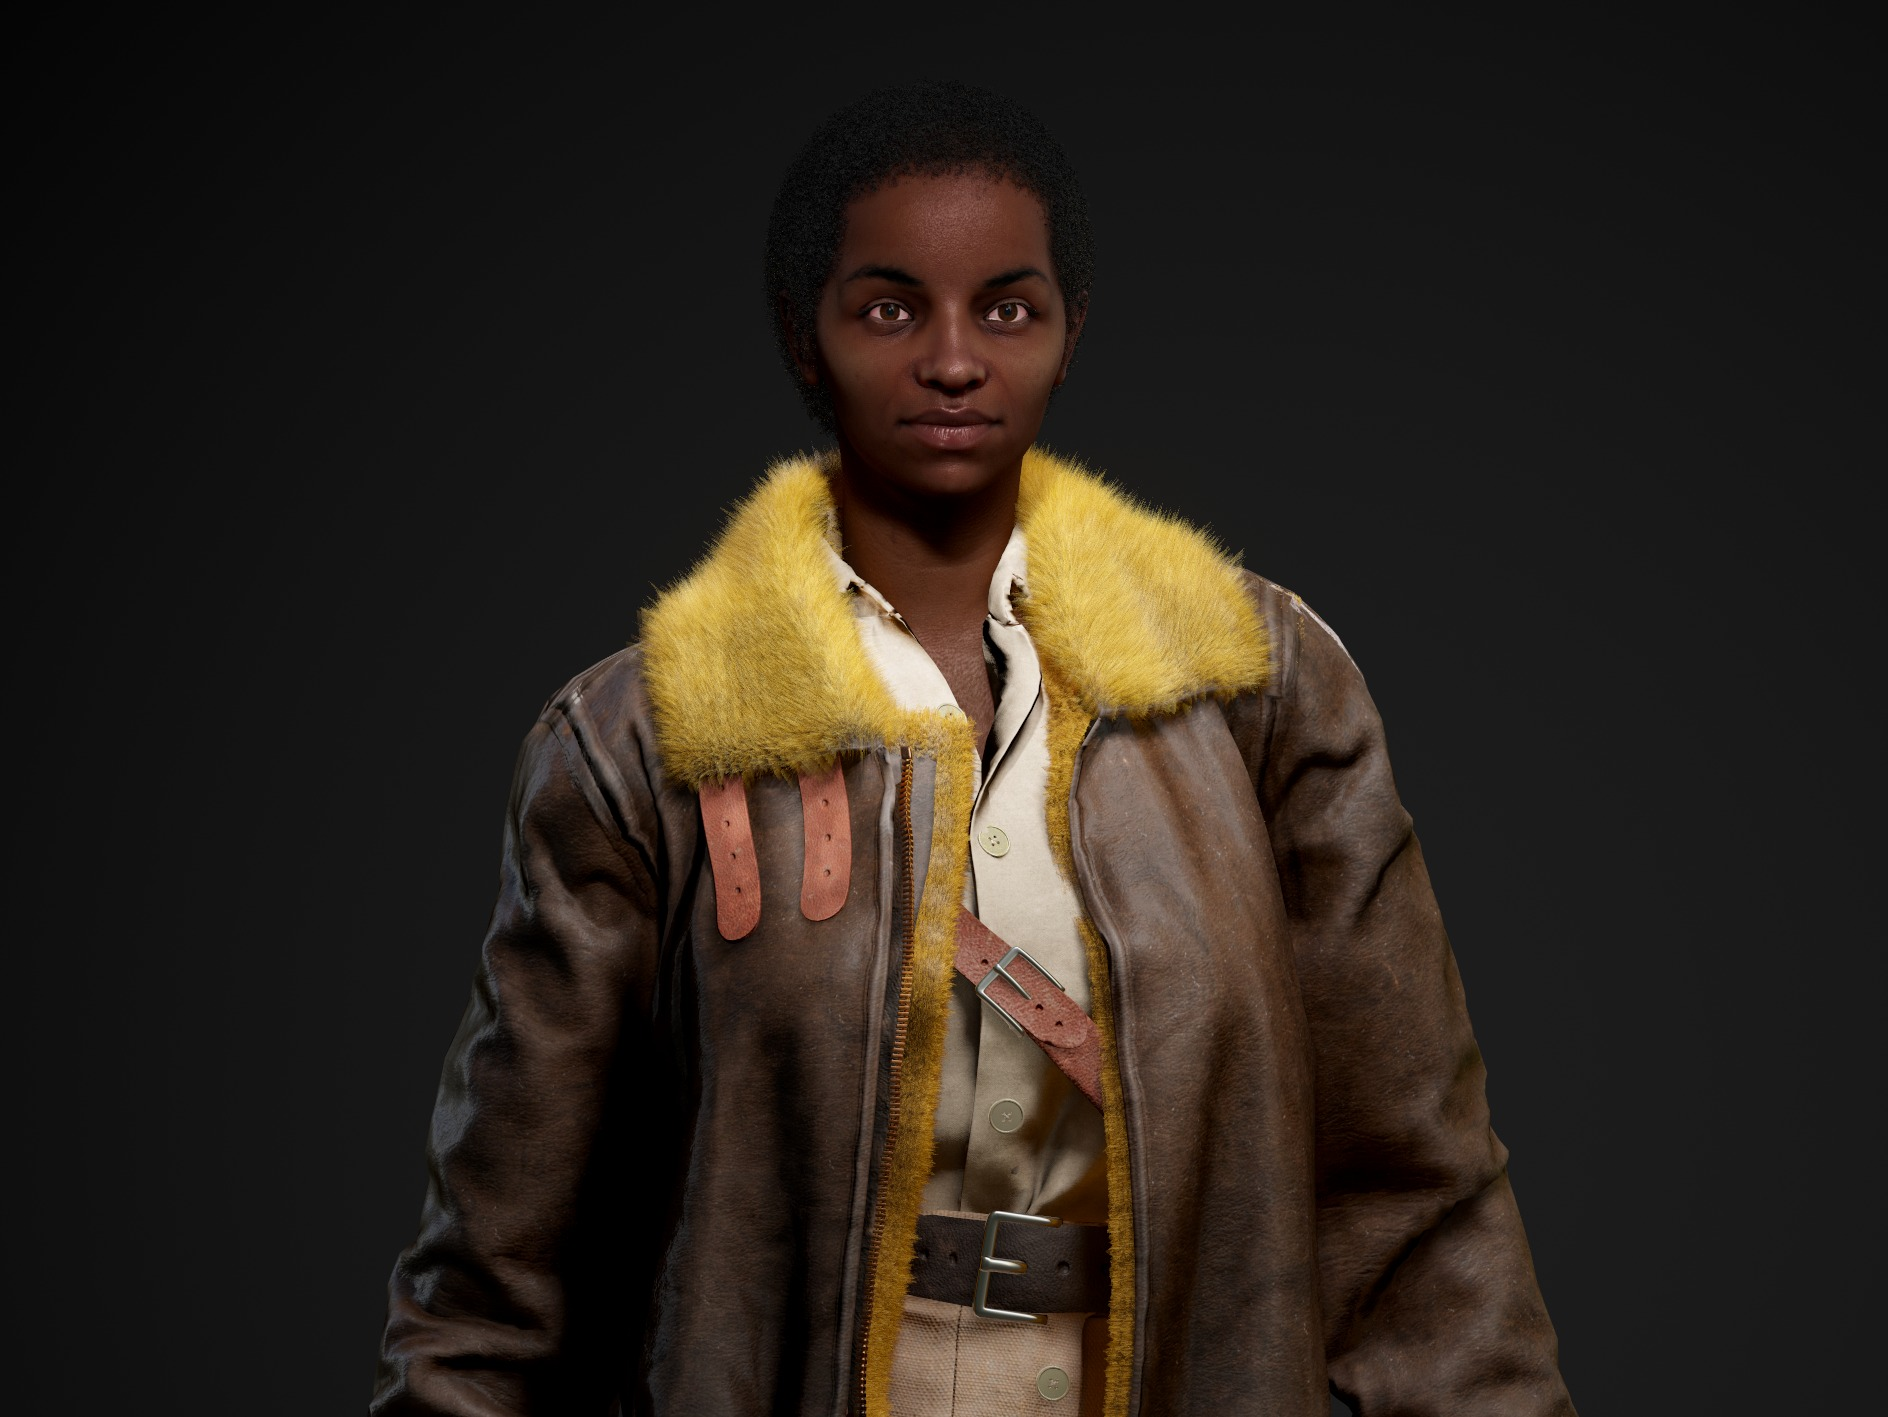 IMD - Real-Time character